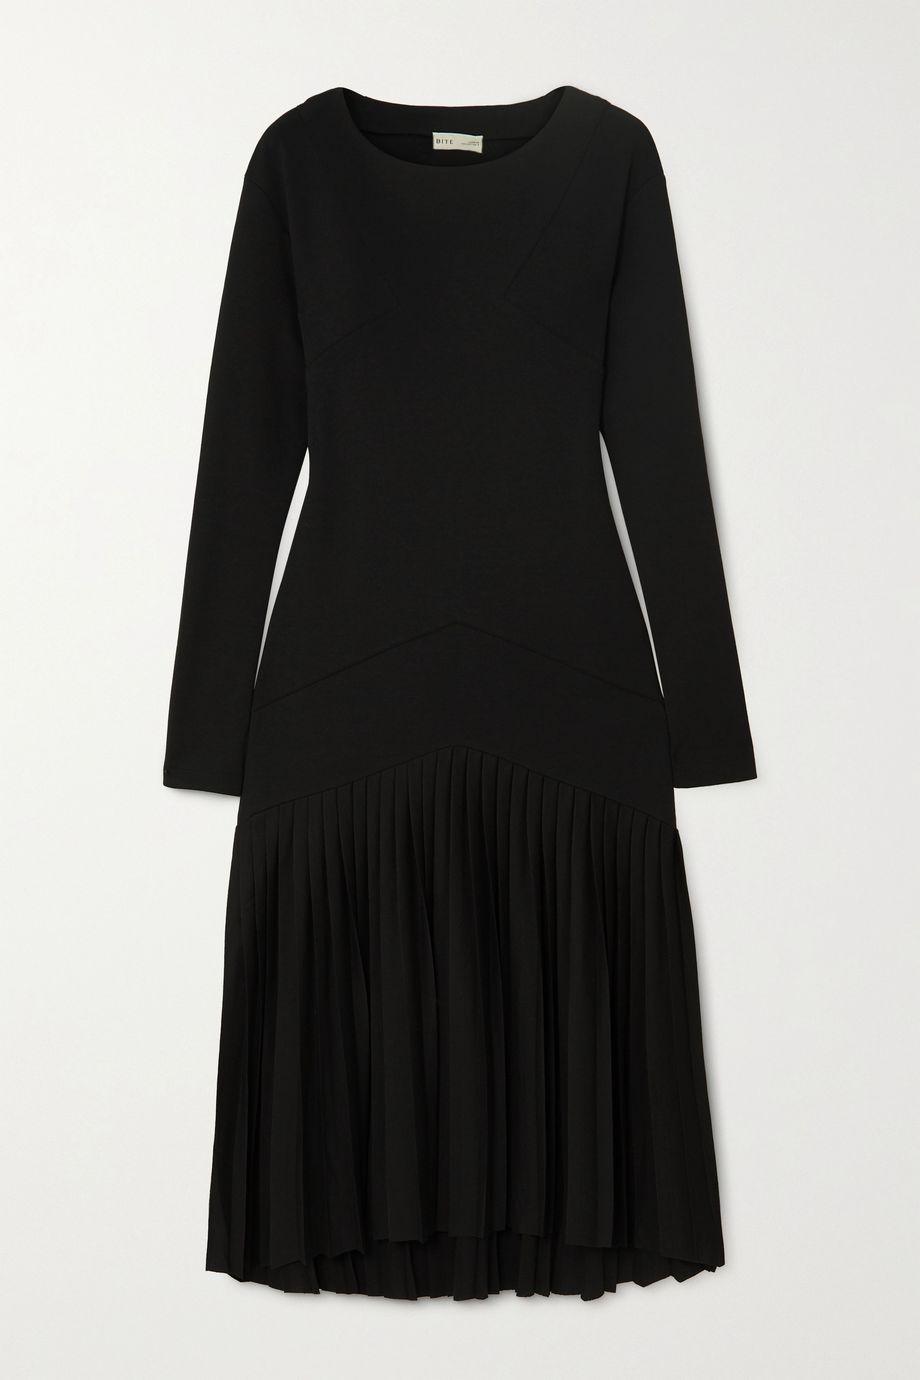 BITE Studios + NET SUSTAIN pleated organic cotton-blend jersey dress